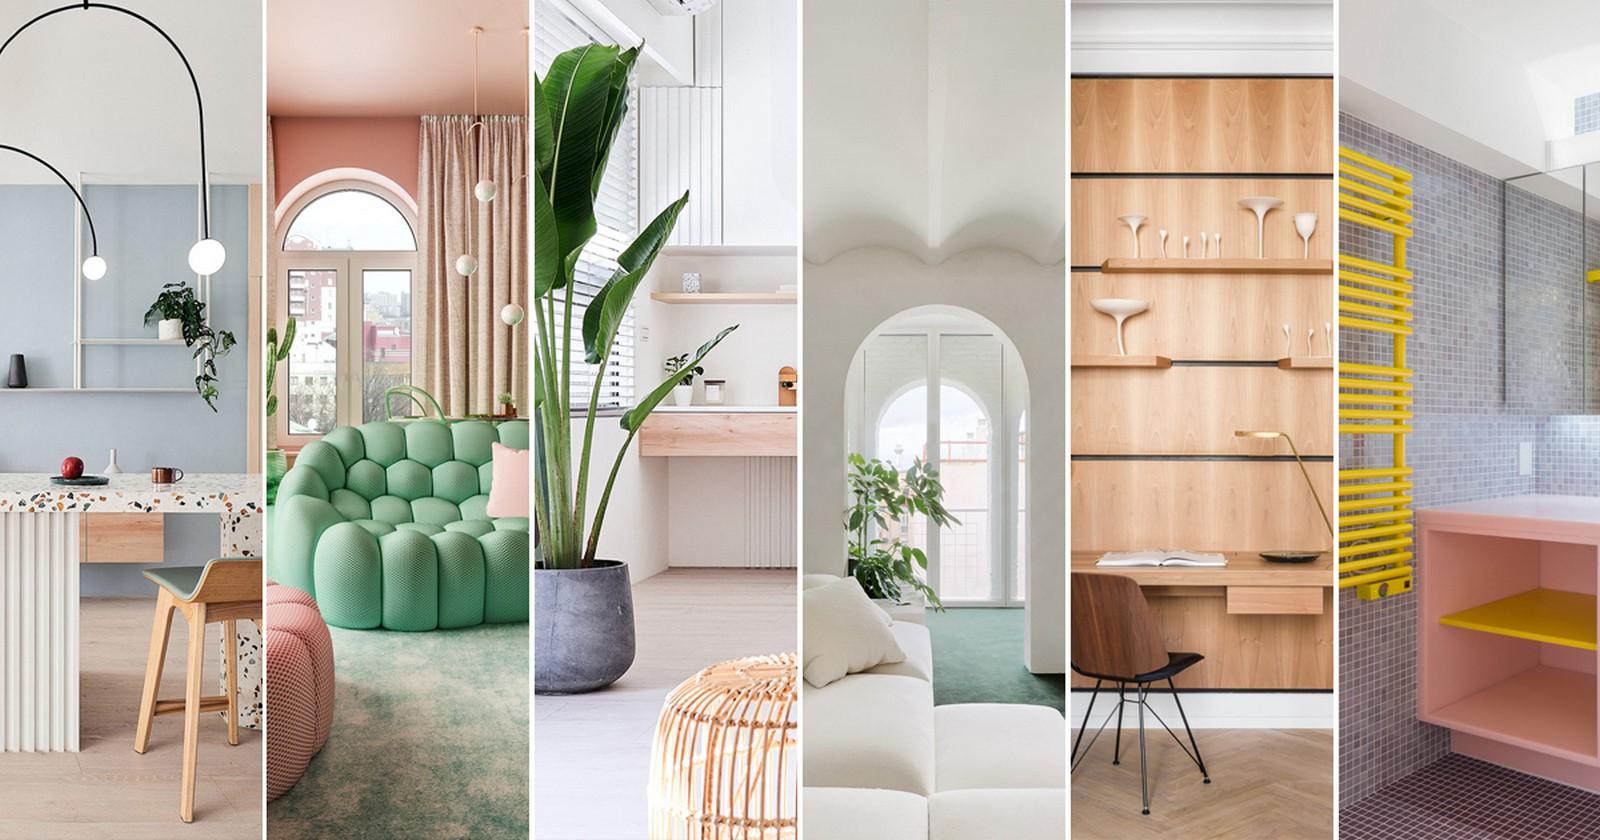 10 beginner level courses in interior design - Sheet3